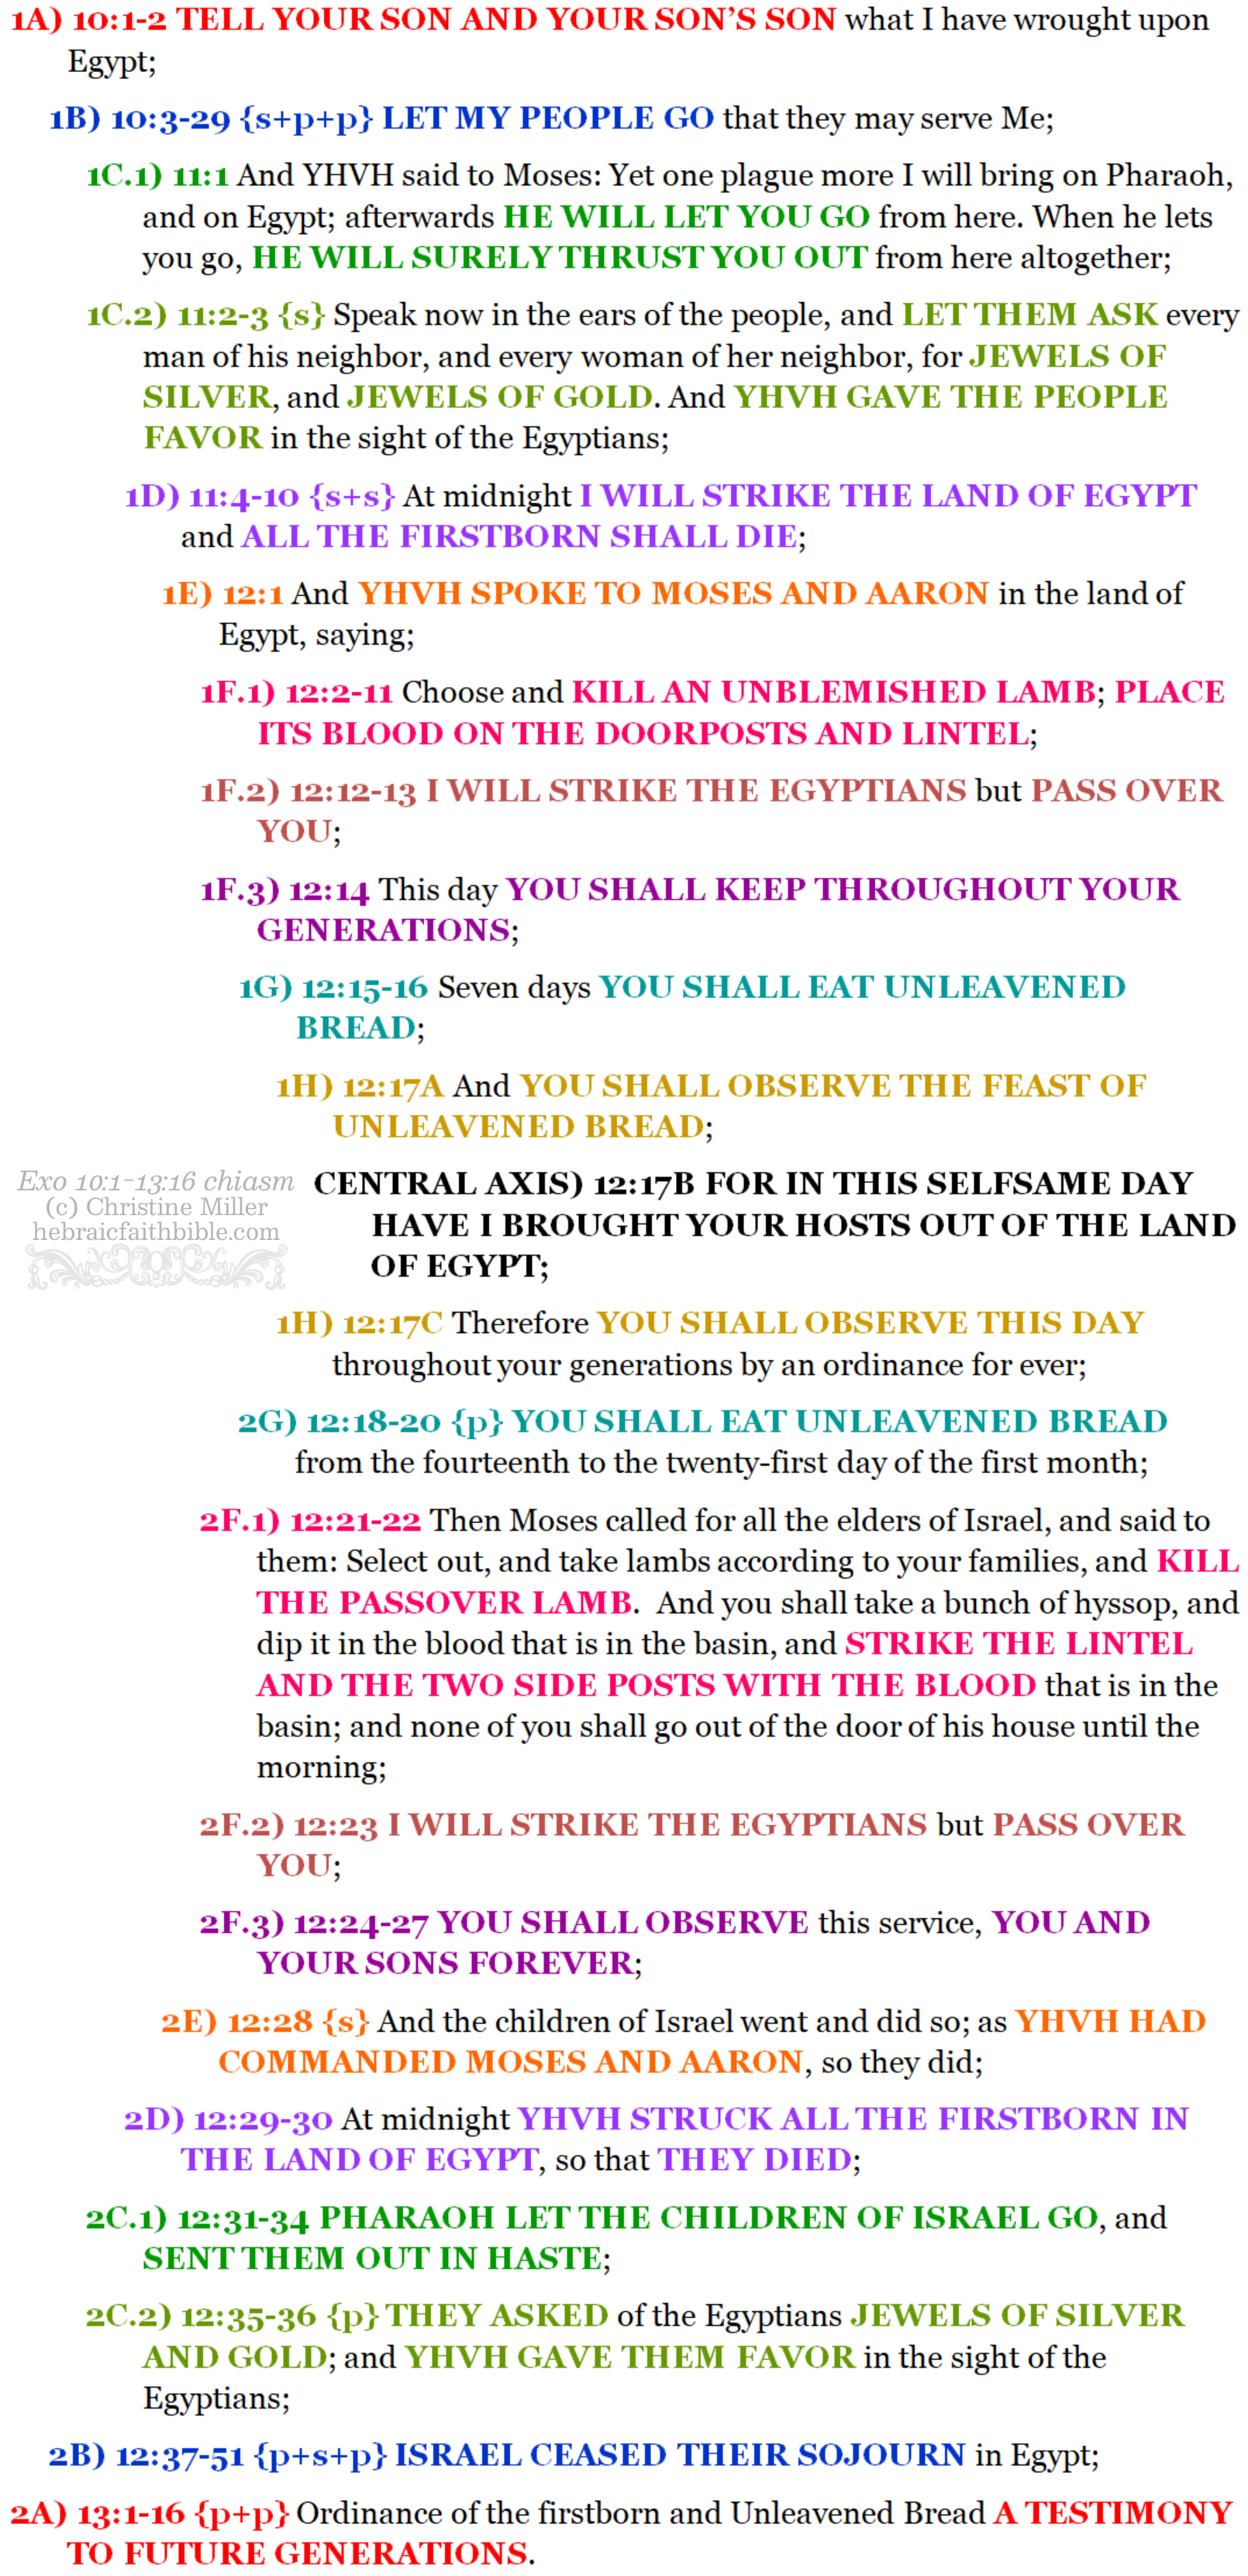 Exo 10:1-13:16 chiasm Bo | hebraicfaithbible.com